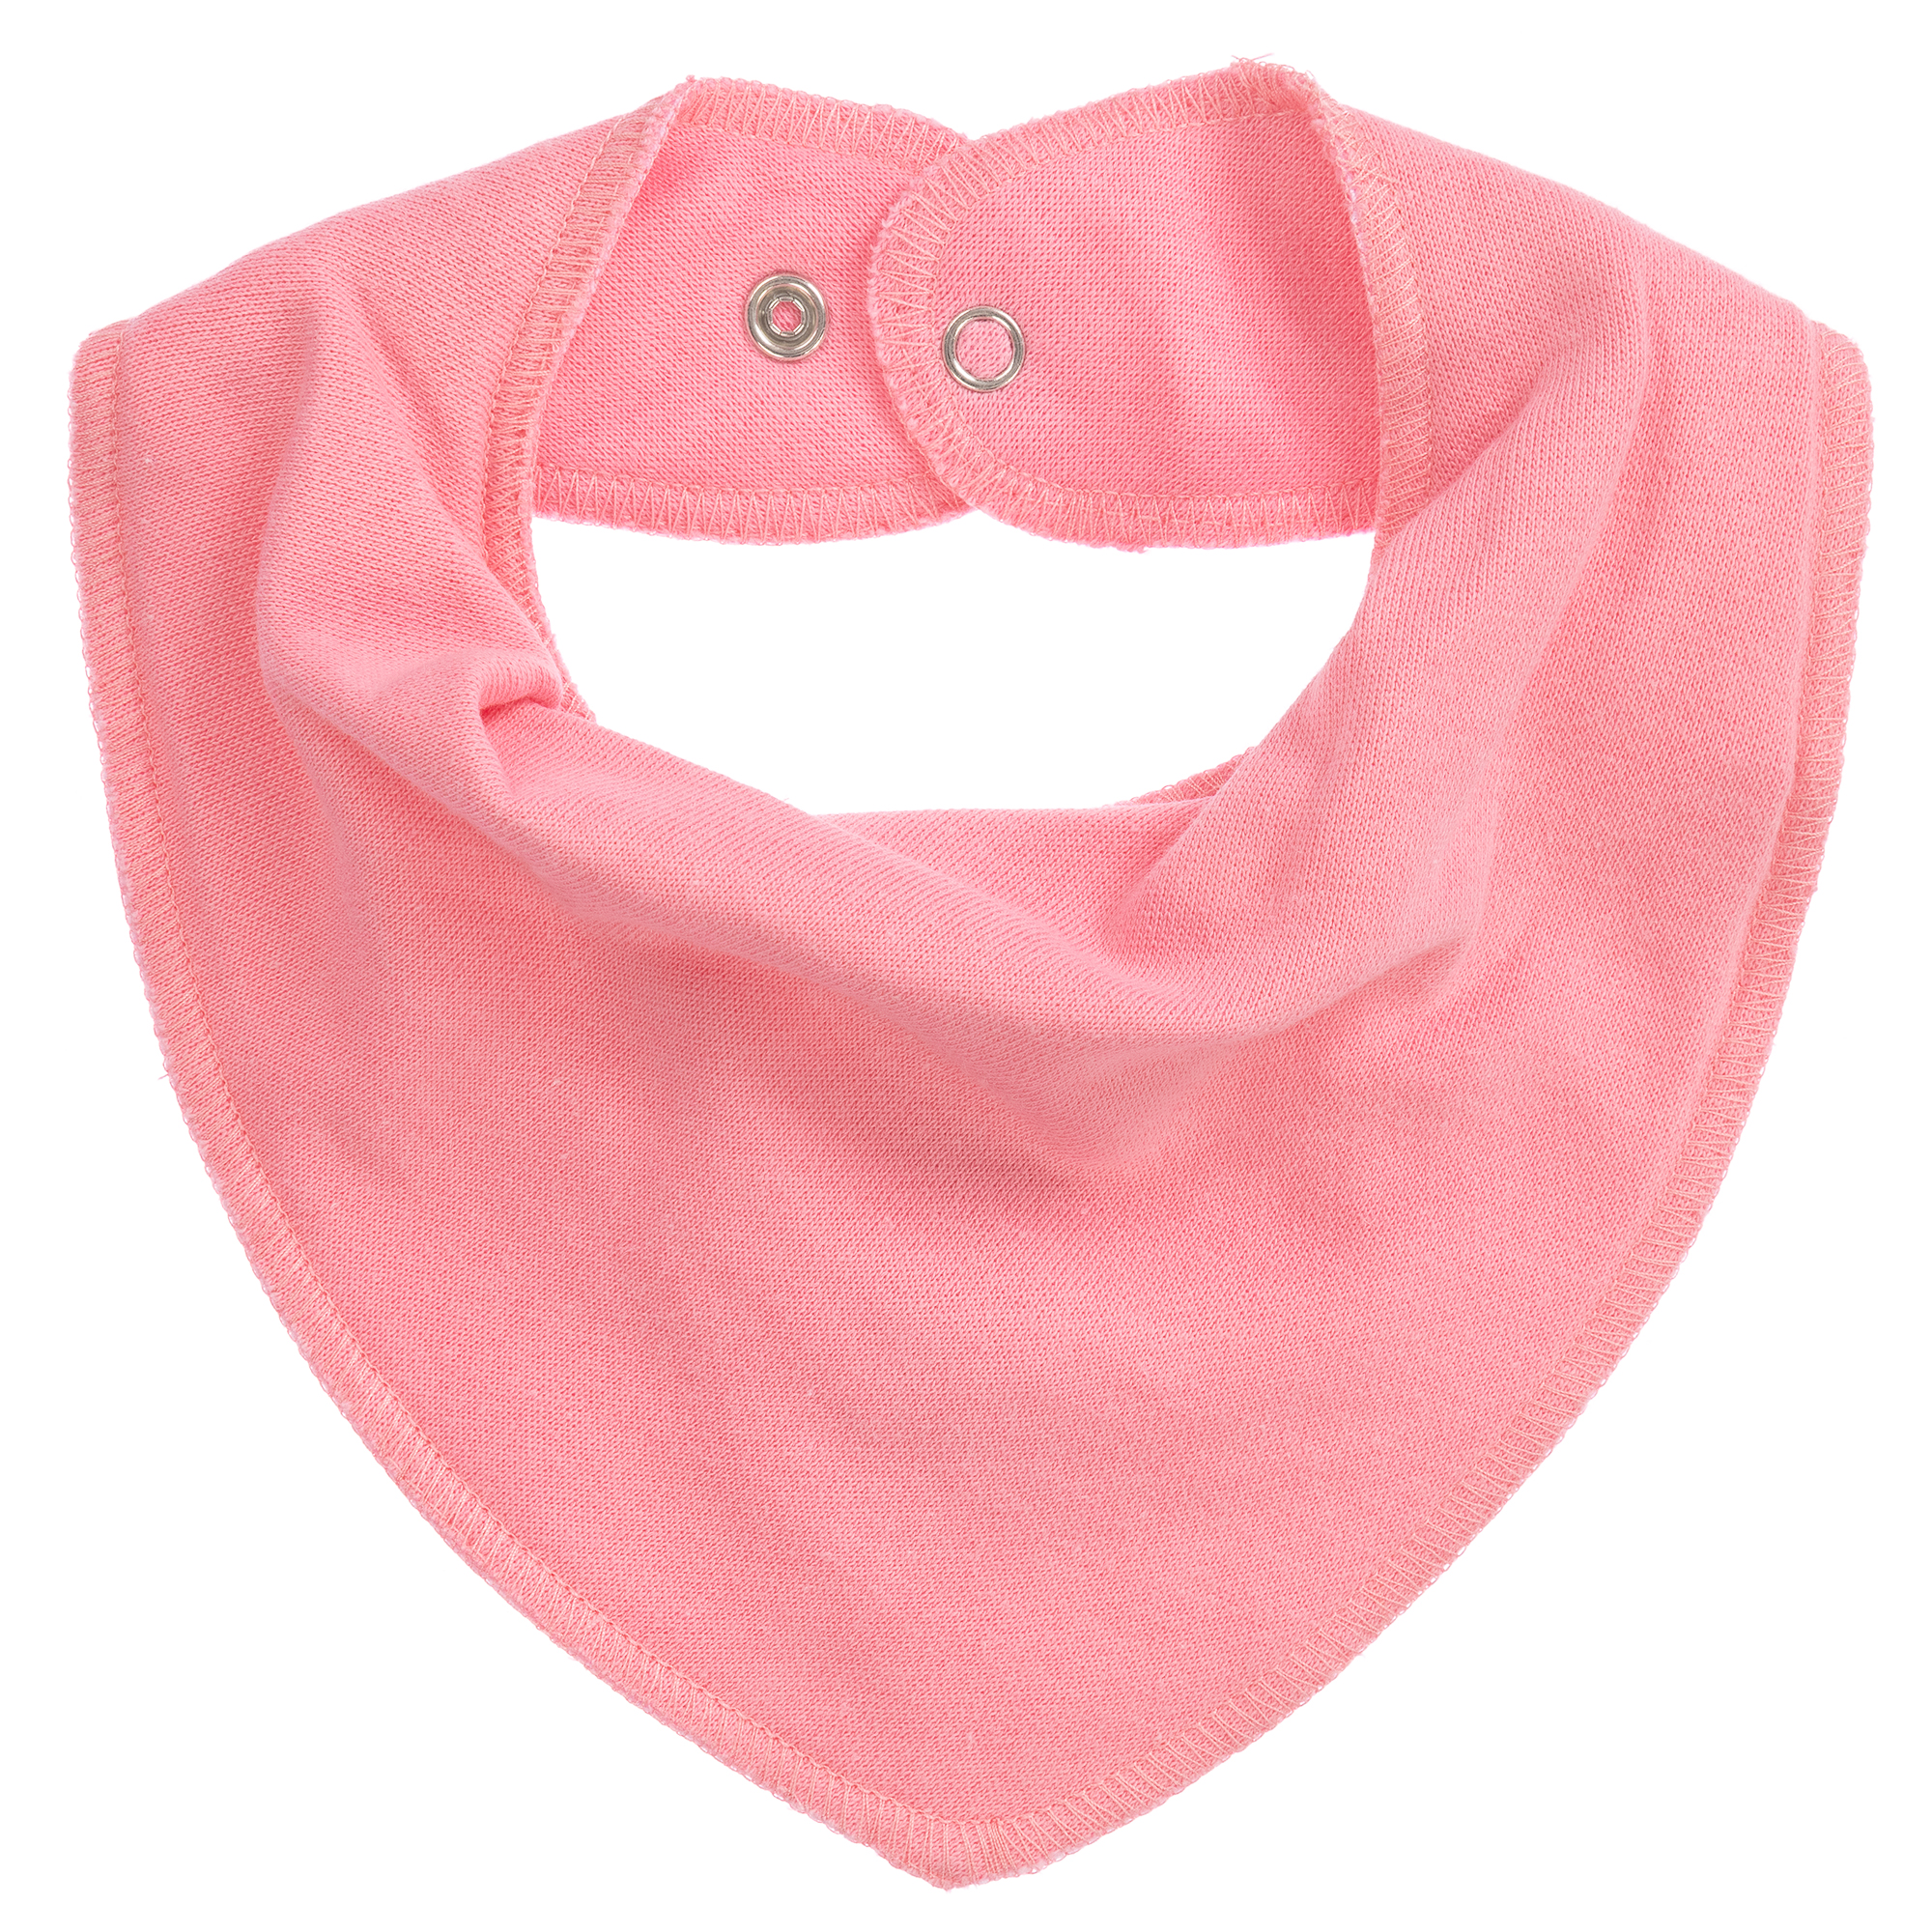 Bandana bib in pink and red